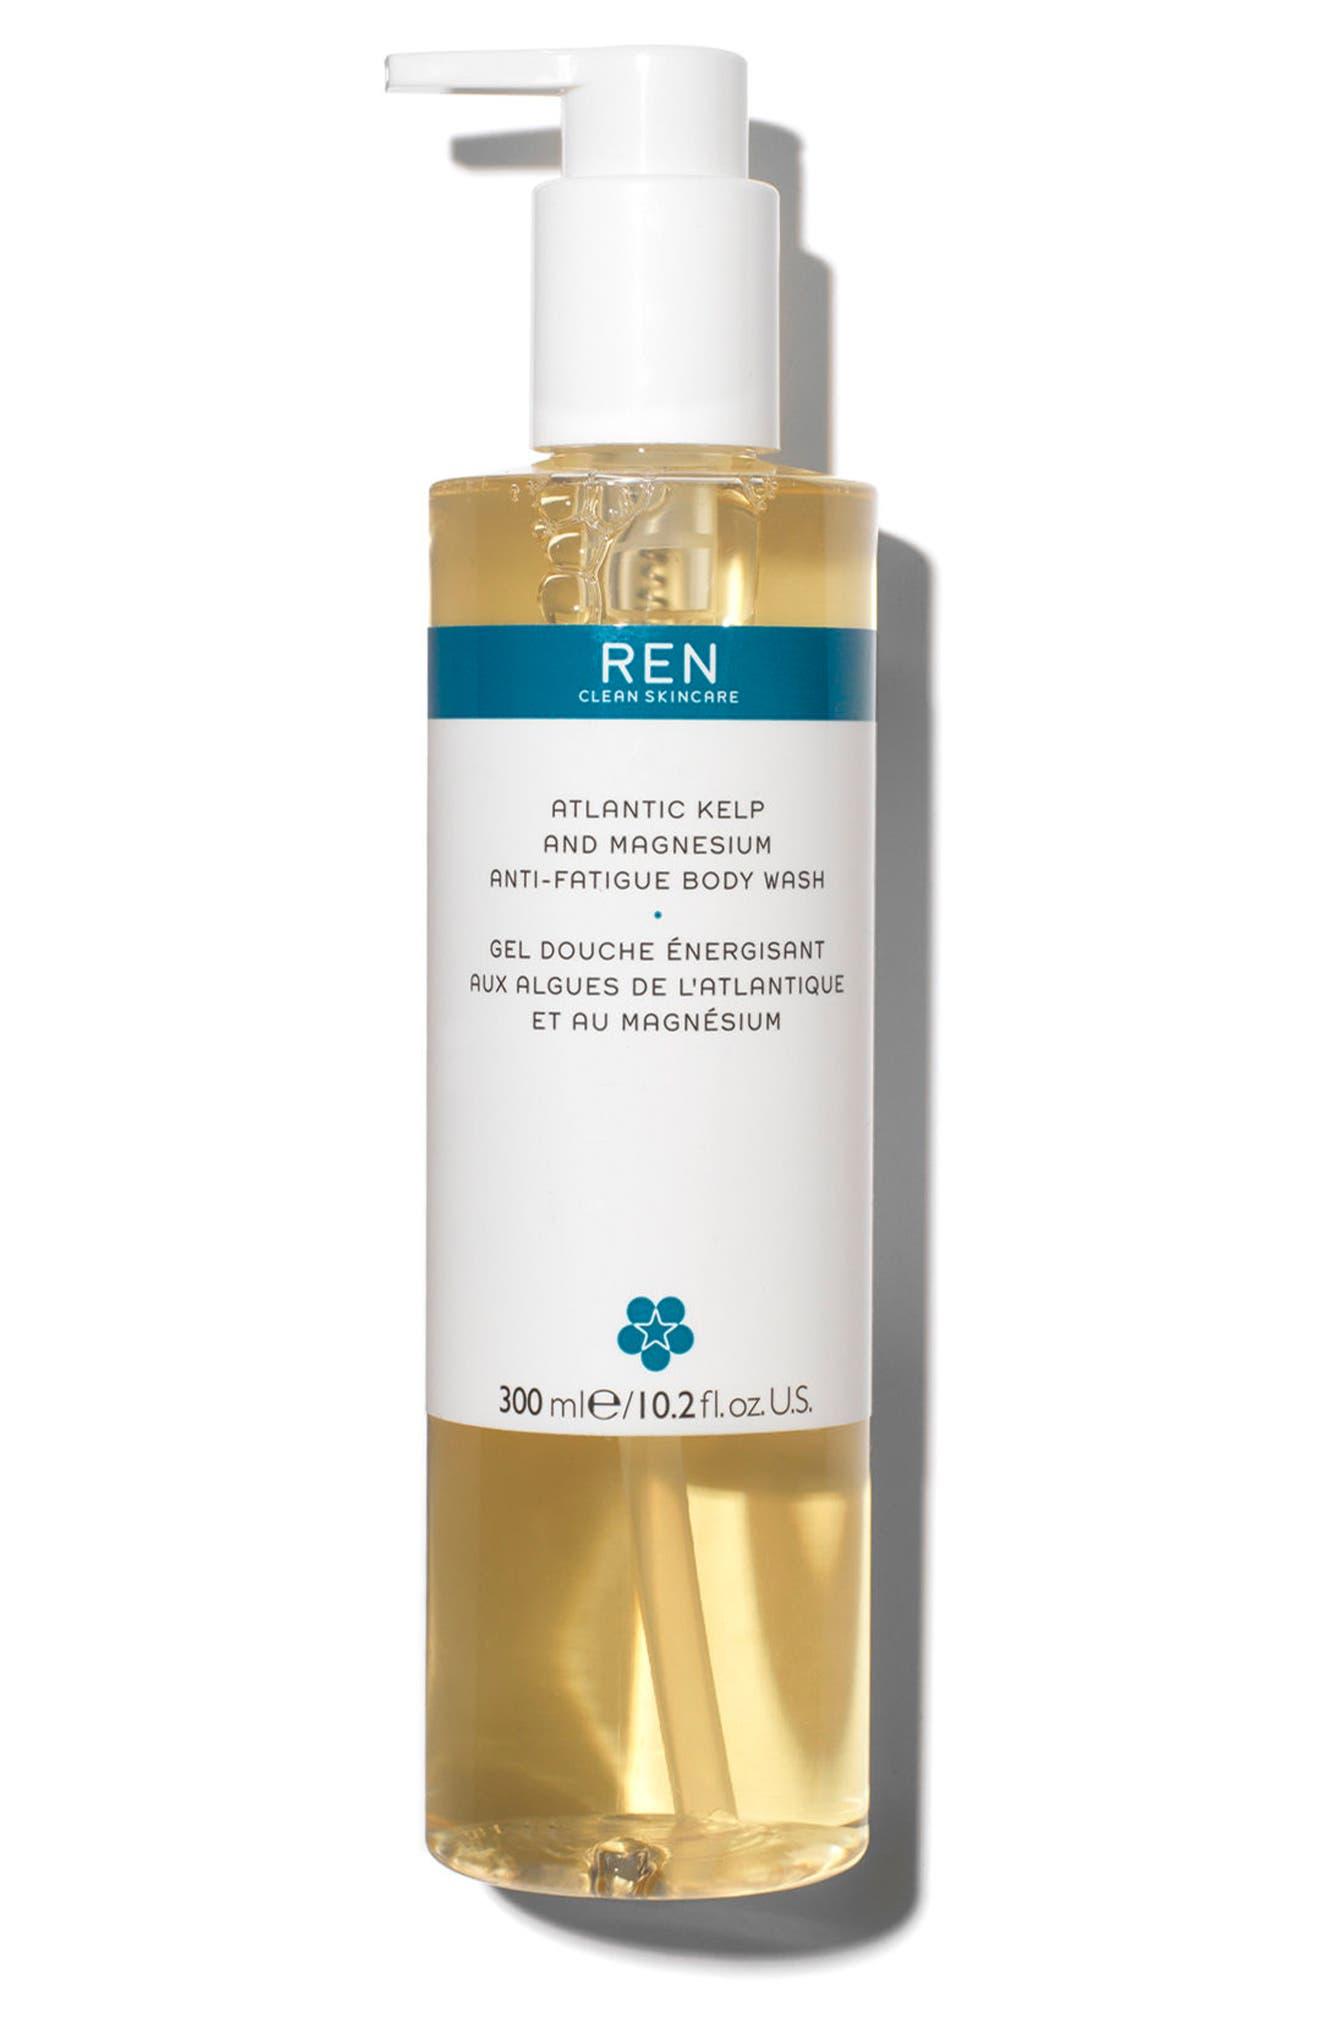 Main Image - SPACE.NK.apothecary REN Atlantic Kelp and Magnesium Anti-Fatigue Body Wash